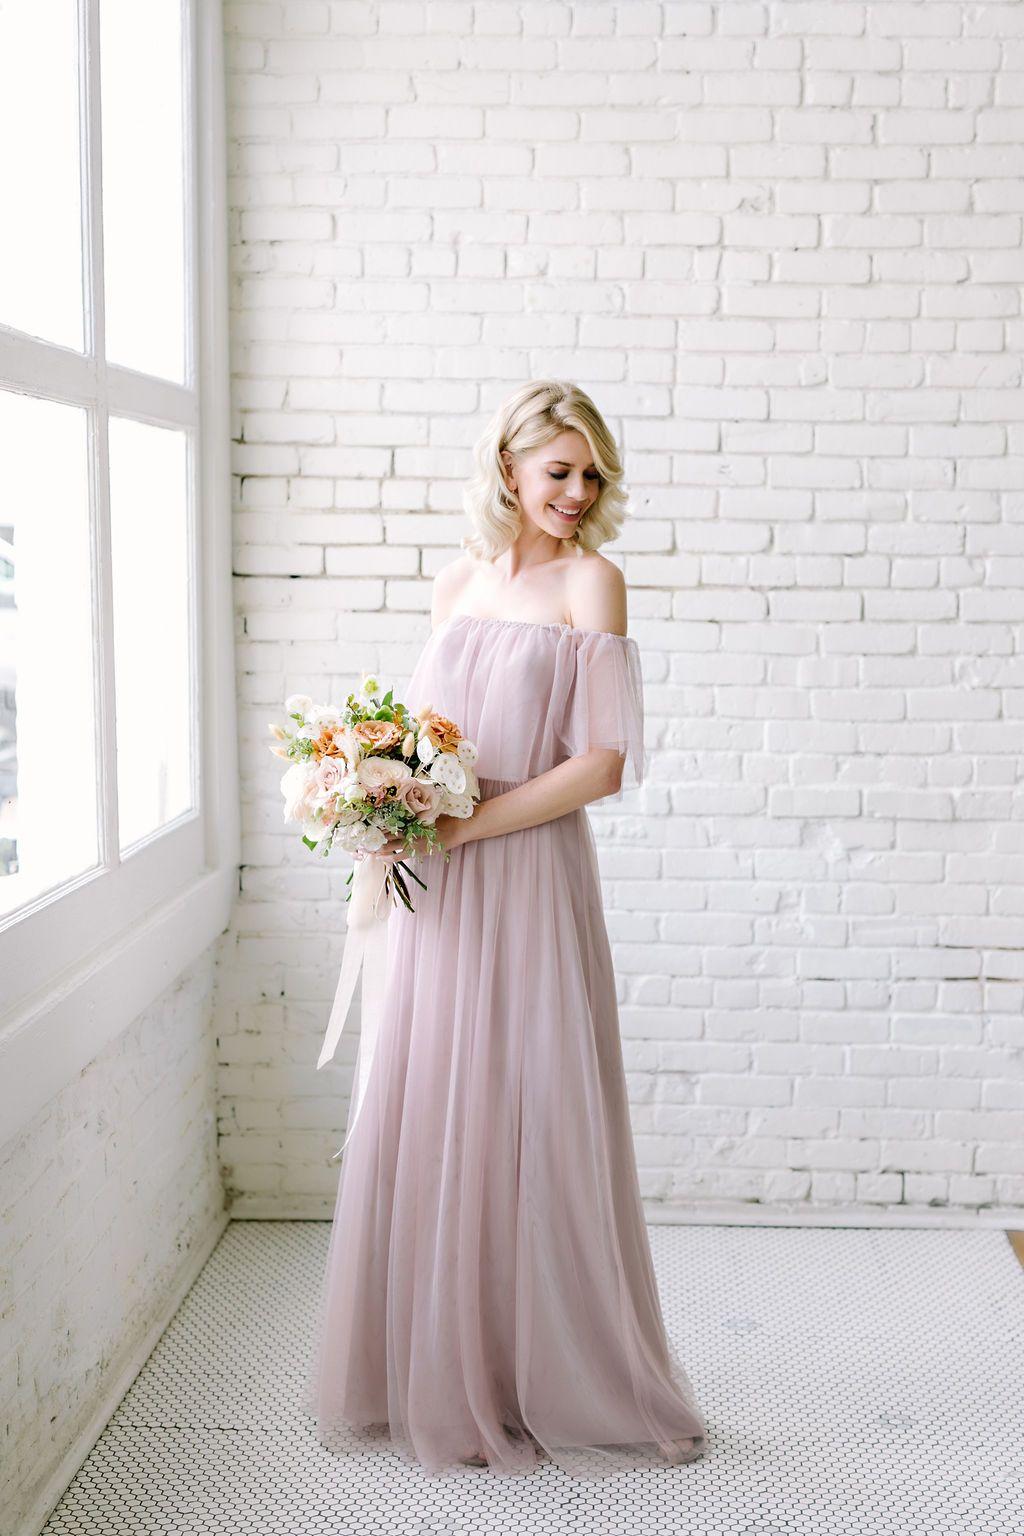 Abigail Tulle Dress In 2020 Bridesmaid Dresses Boho Bridesmaid Dresses Tulle Bridesmaid Dress